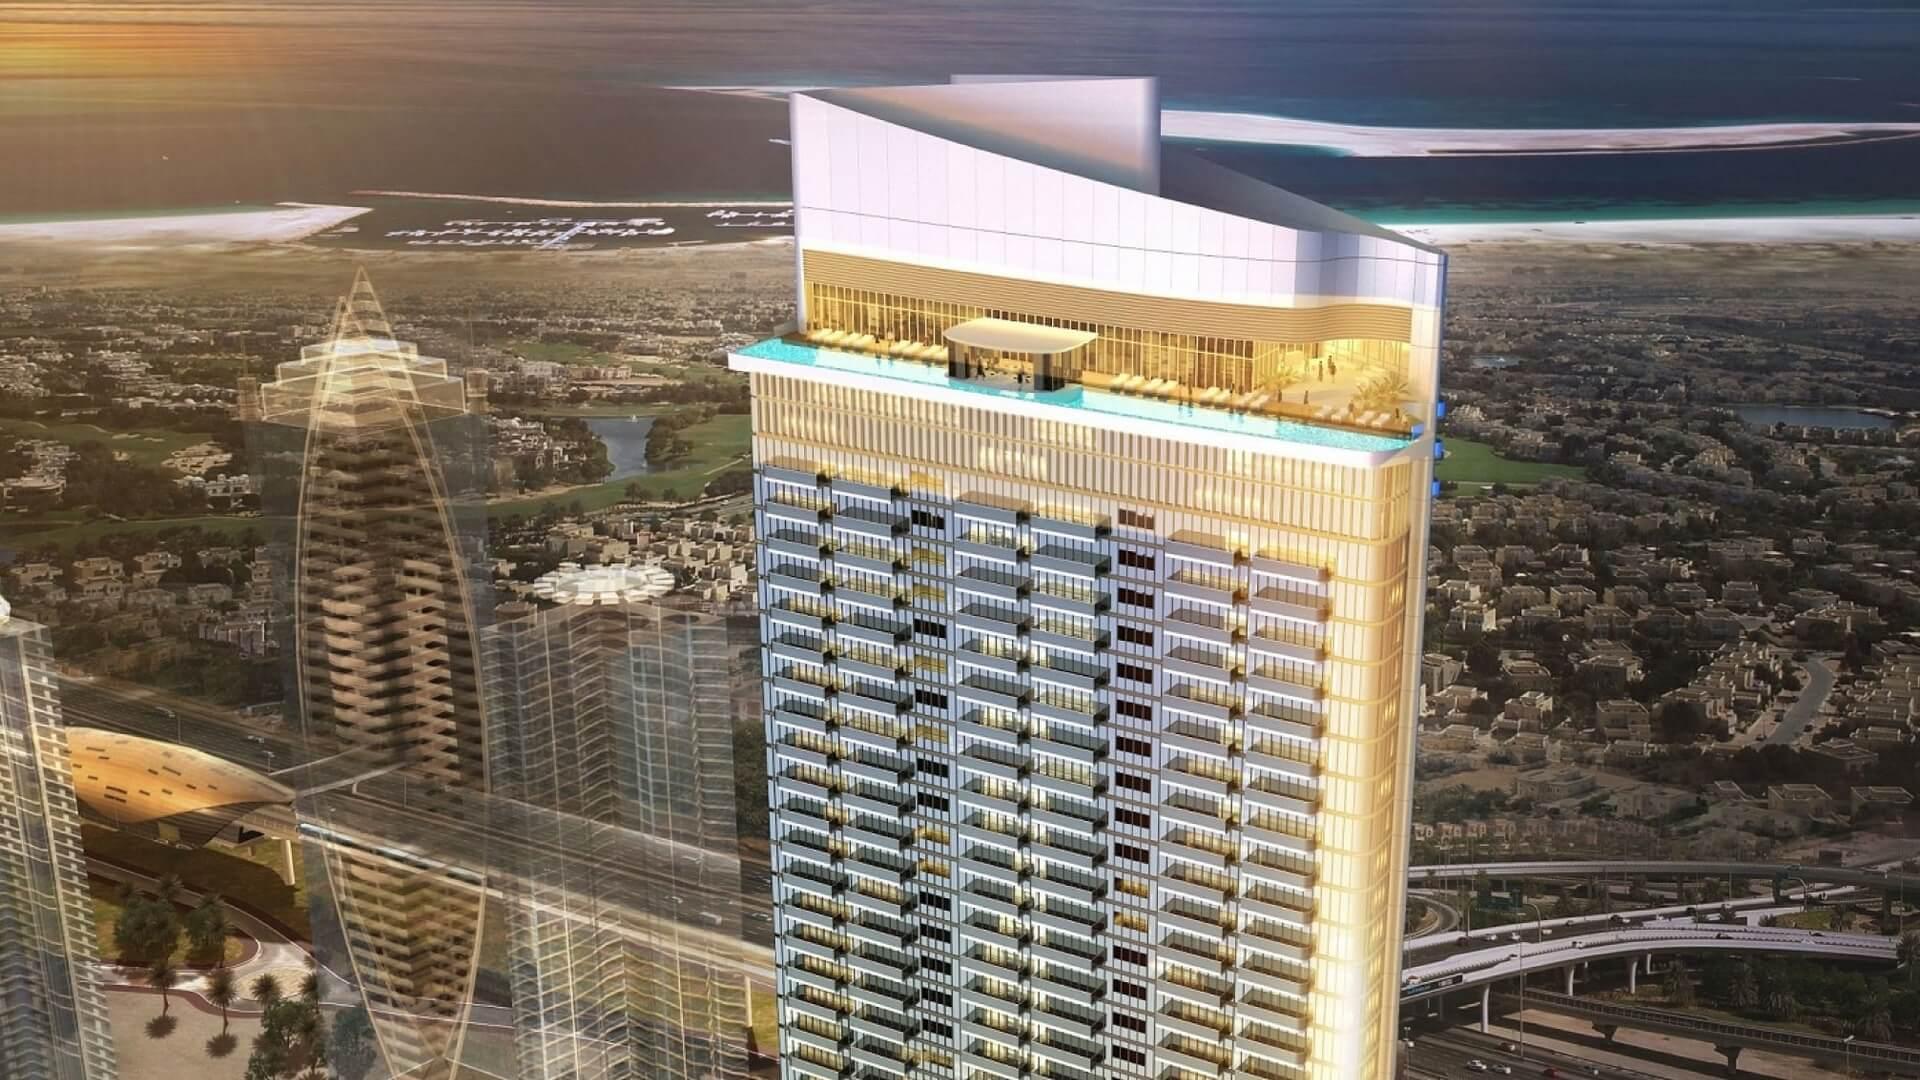 PARAMOUNT TOWER HOTEL & RESIDENCES, Business Bay, Dubai, UAE – photo 4